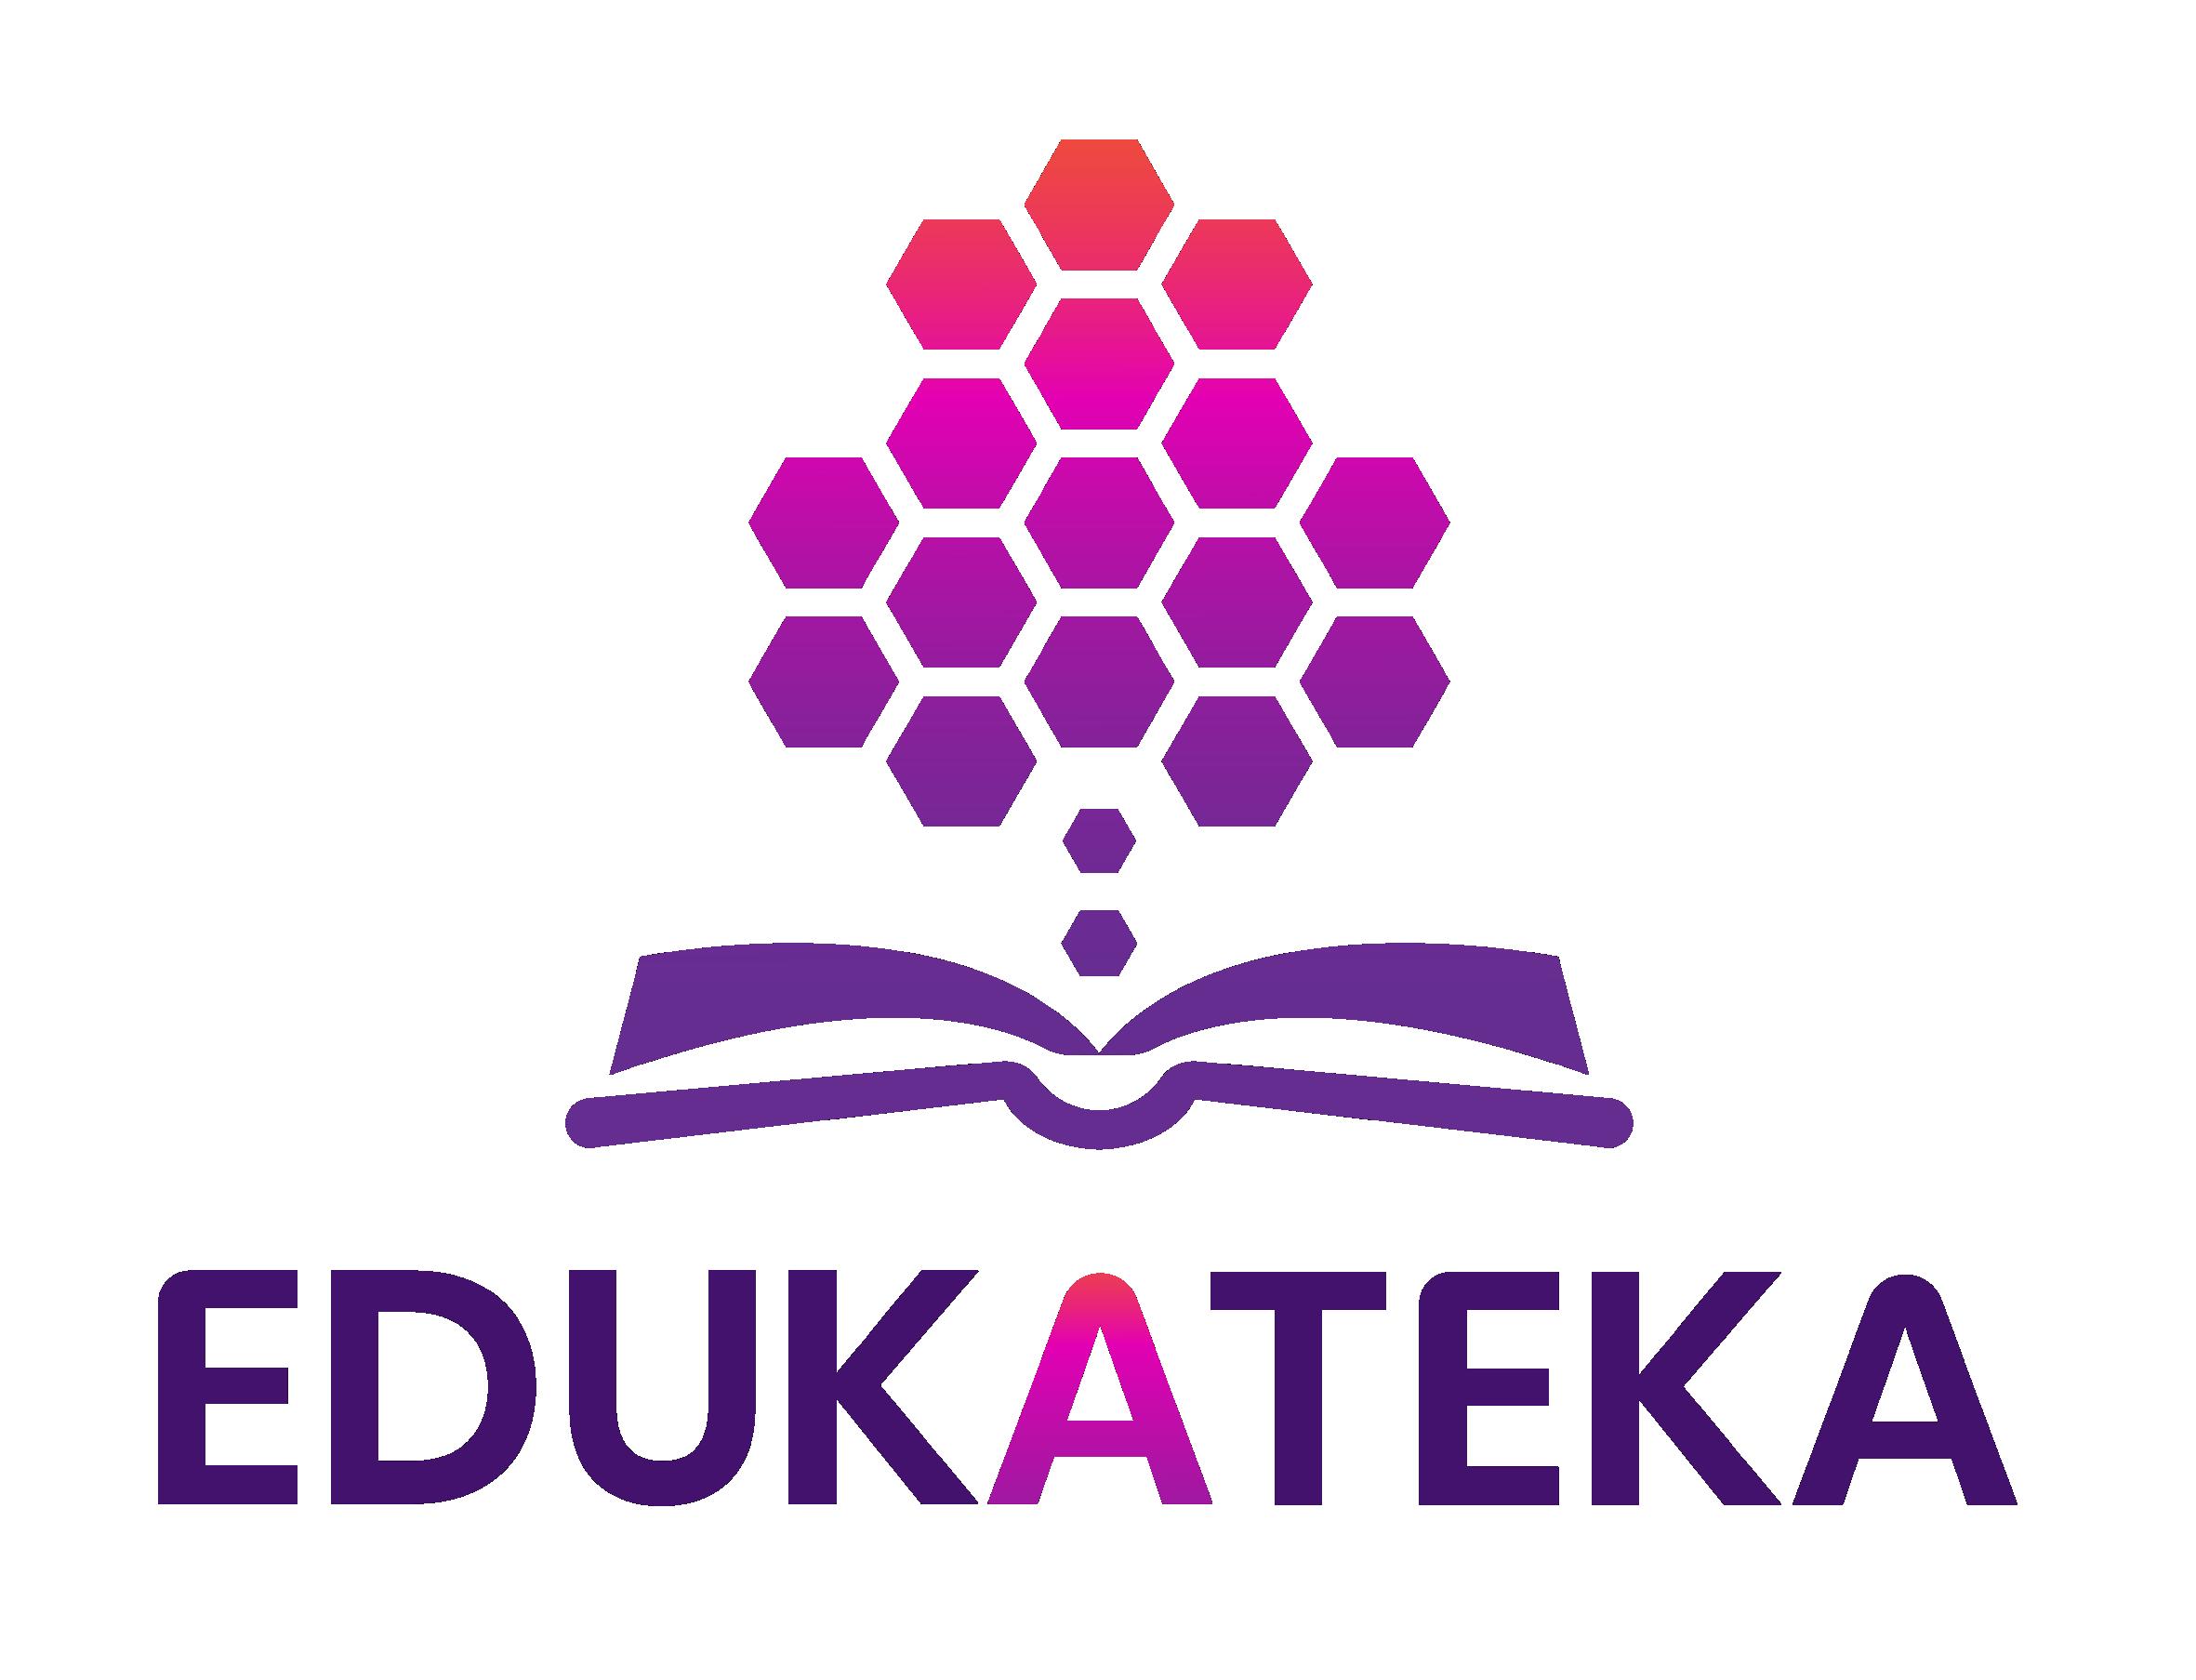 Edukateka Logotipas